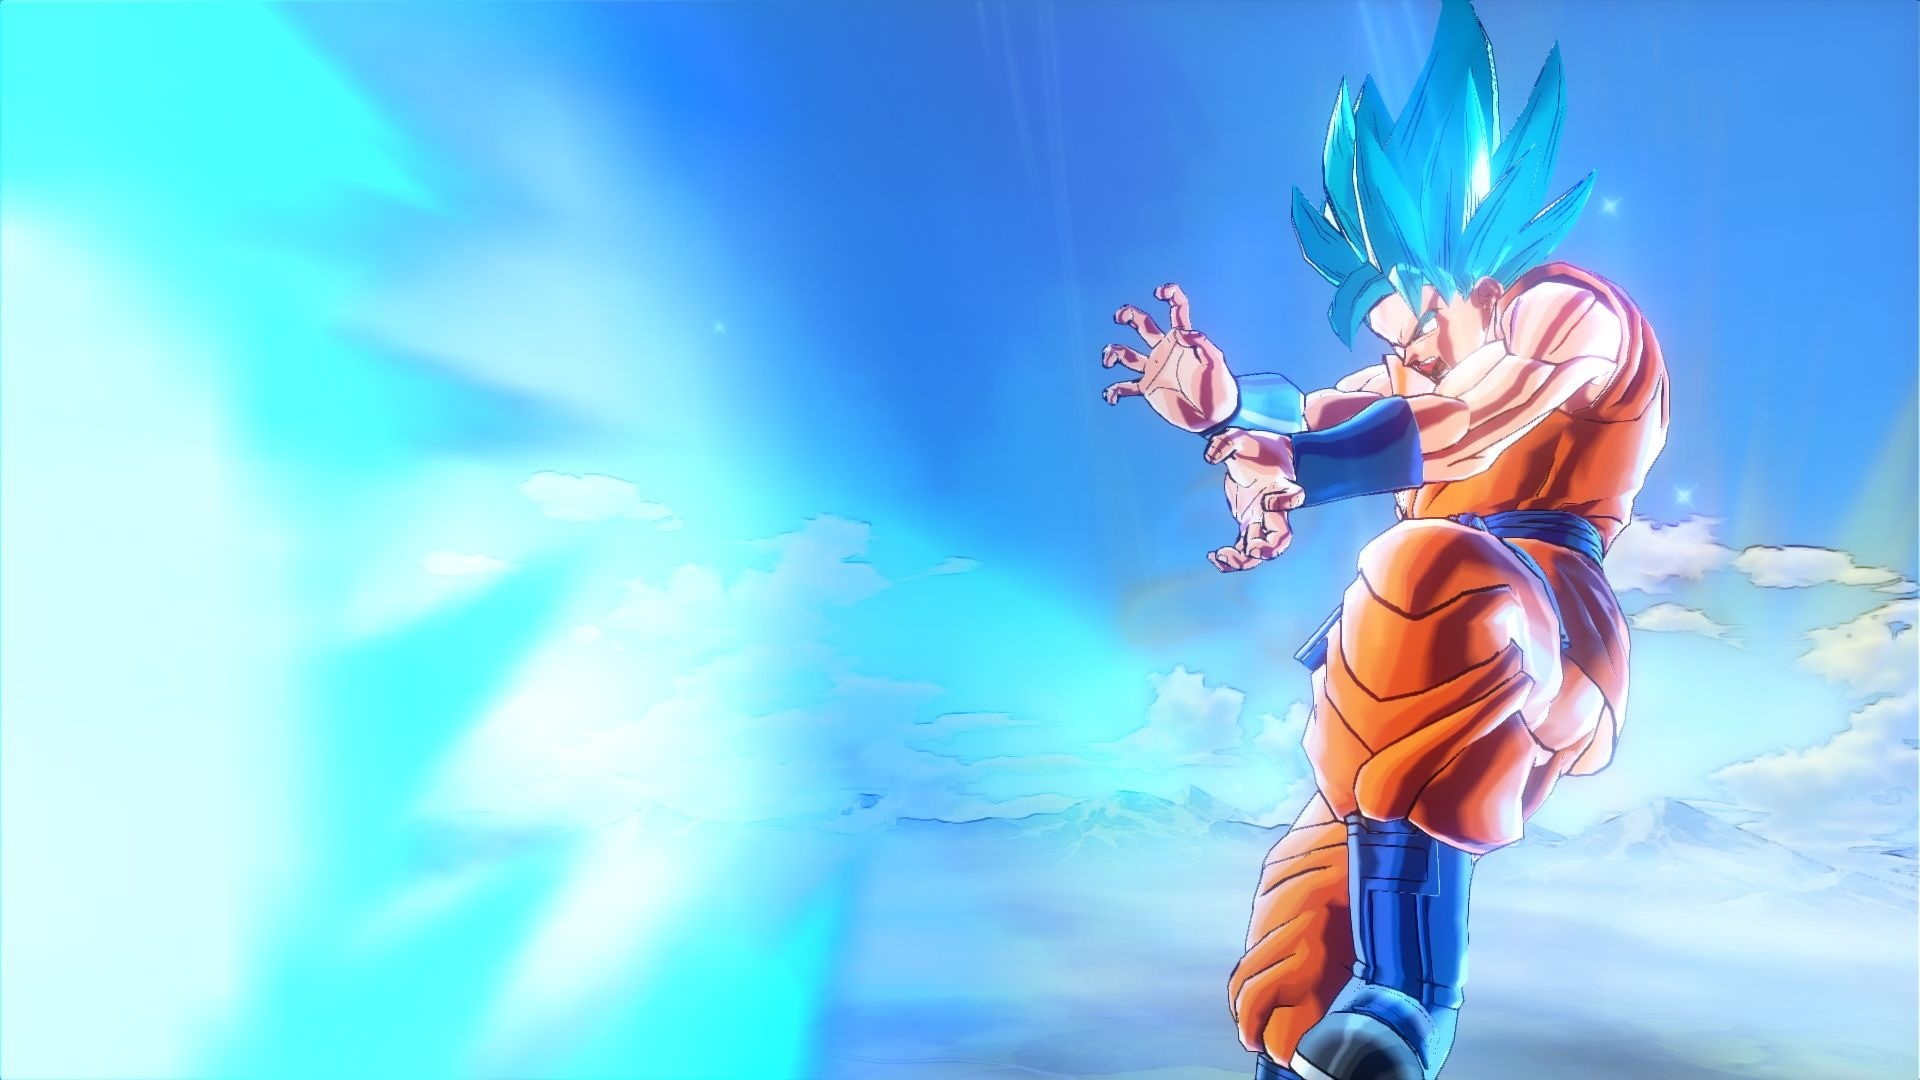 Super Saiyan God Super Saiyan Goku has the Ultimate Kamehameha, Golden  Frieza uses the Emperor's Death Beam technique, and Super Saiyan God Super  Saiyan …